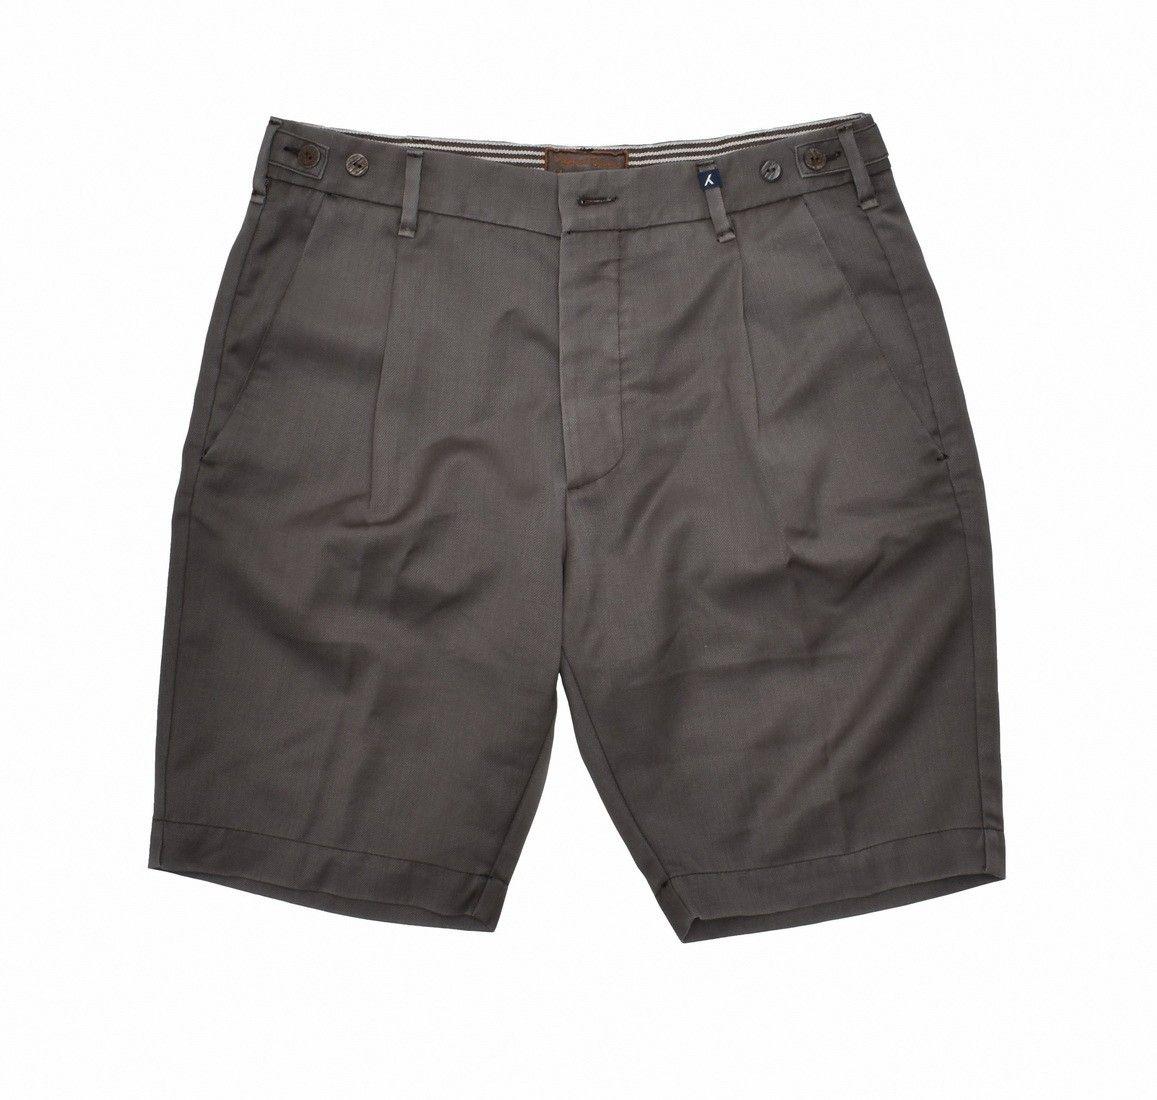 MYTHS - Herren Bermuda Short - Mud